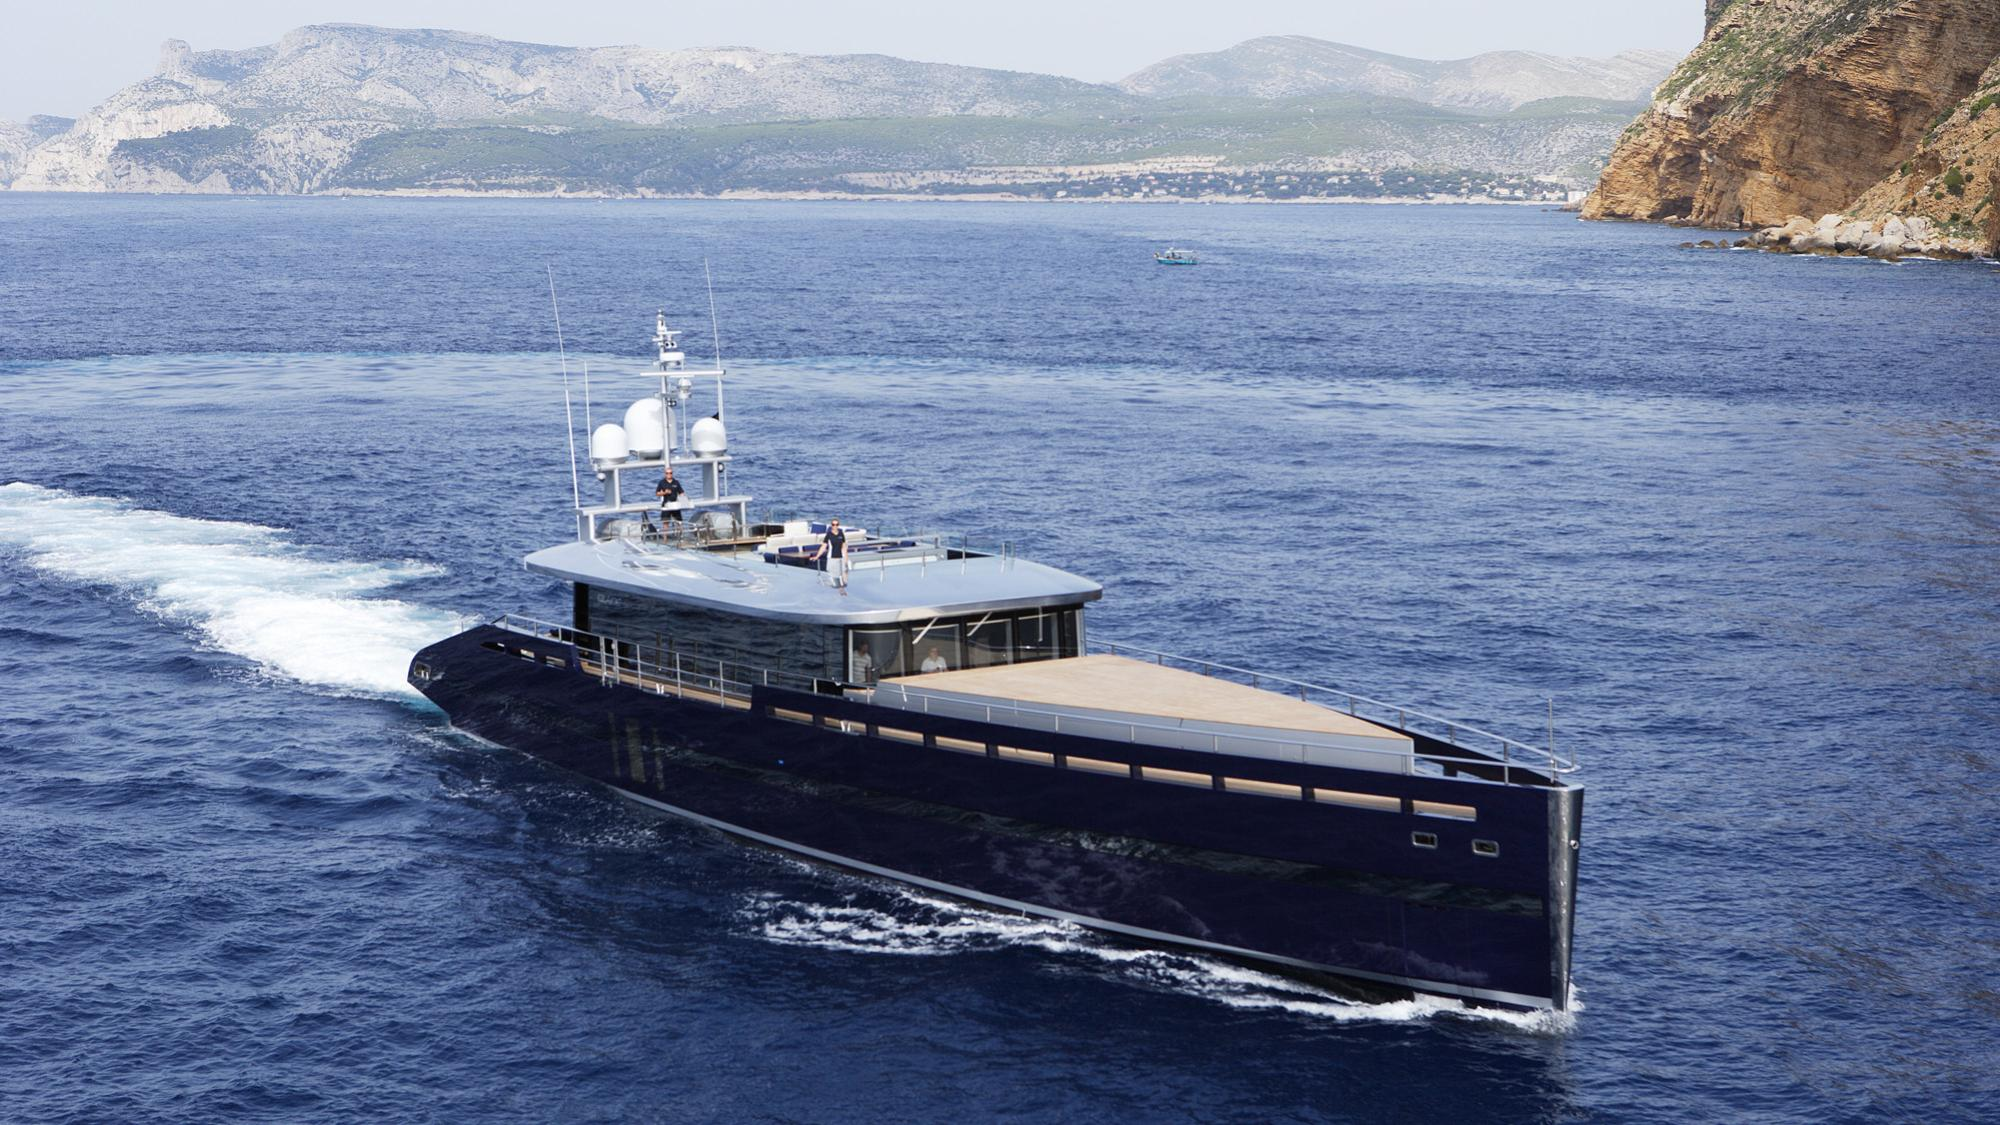 blade-motor-yacht-mmgi-2010-44m-half-profile-cruising